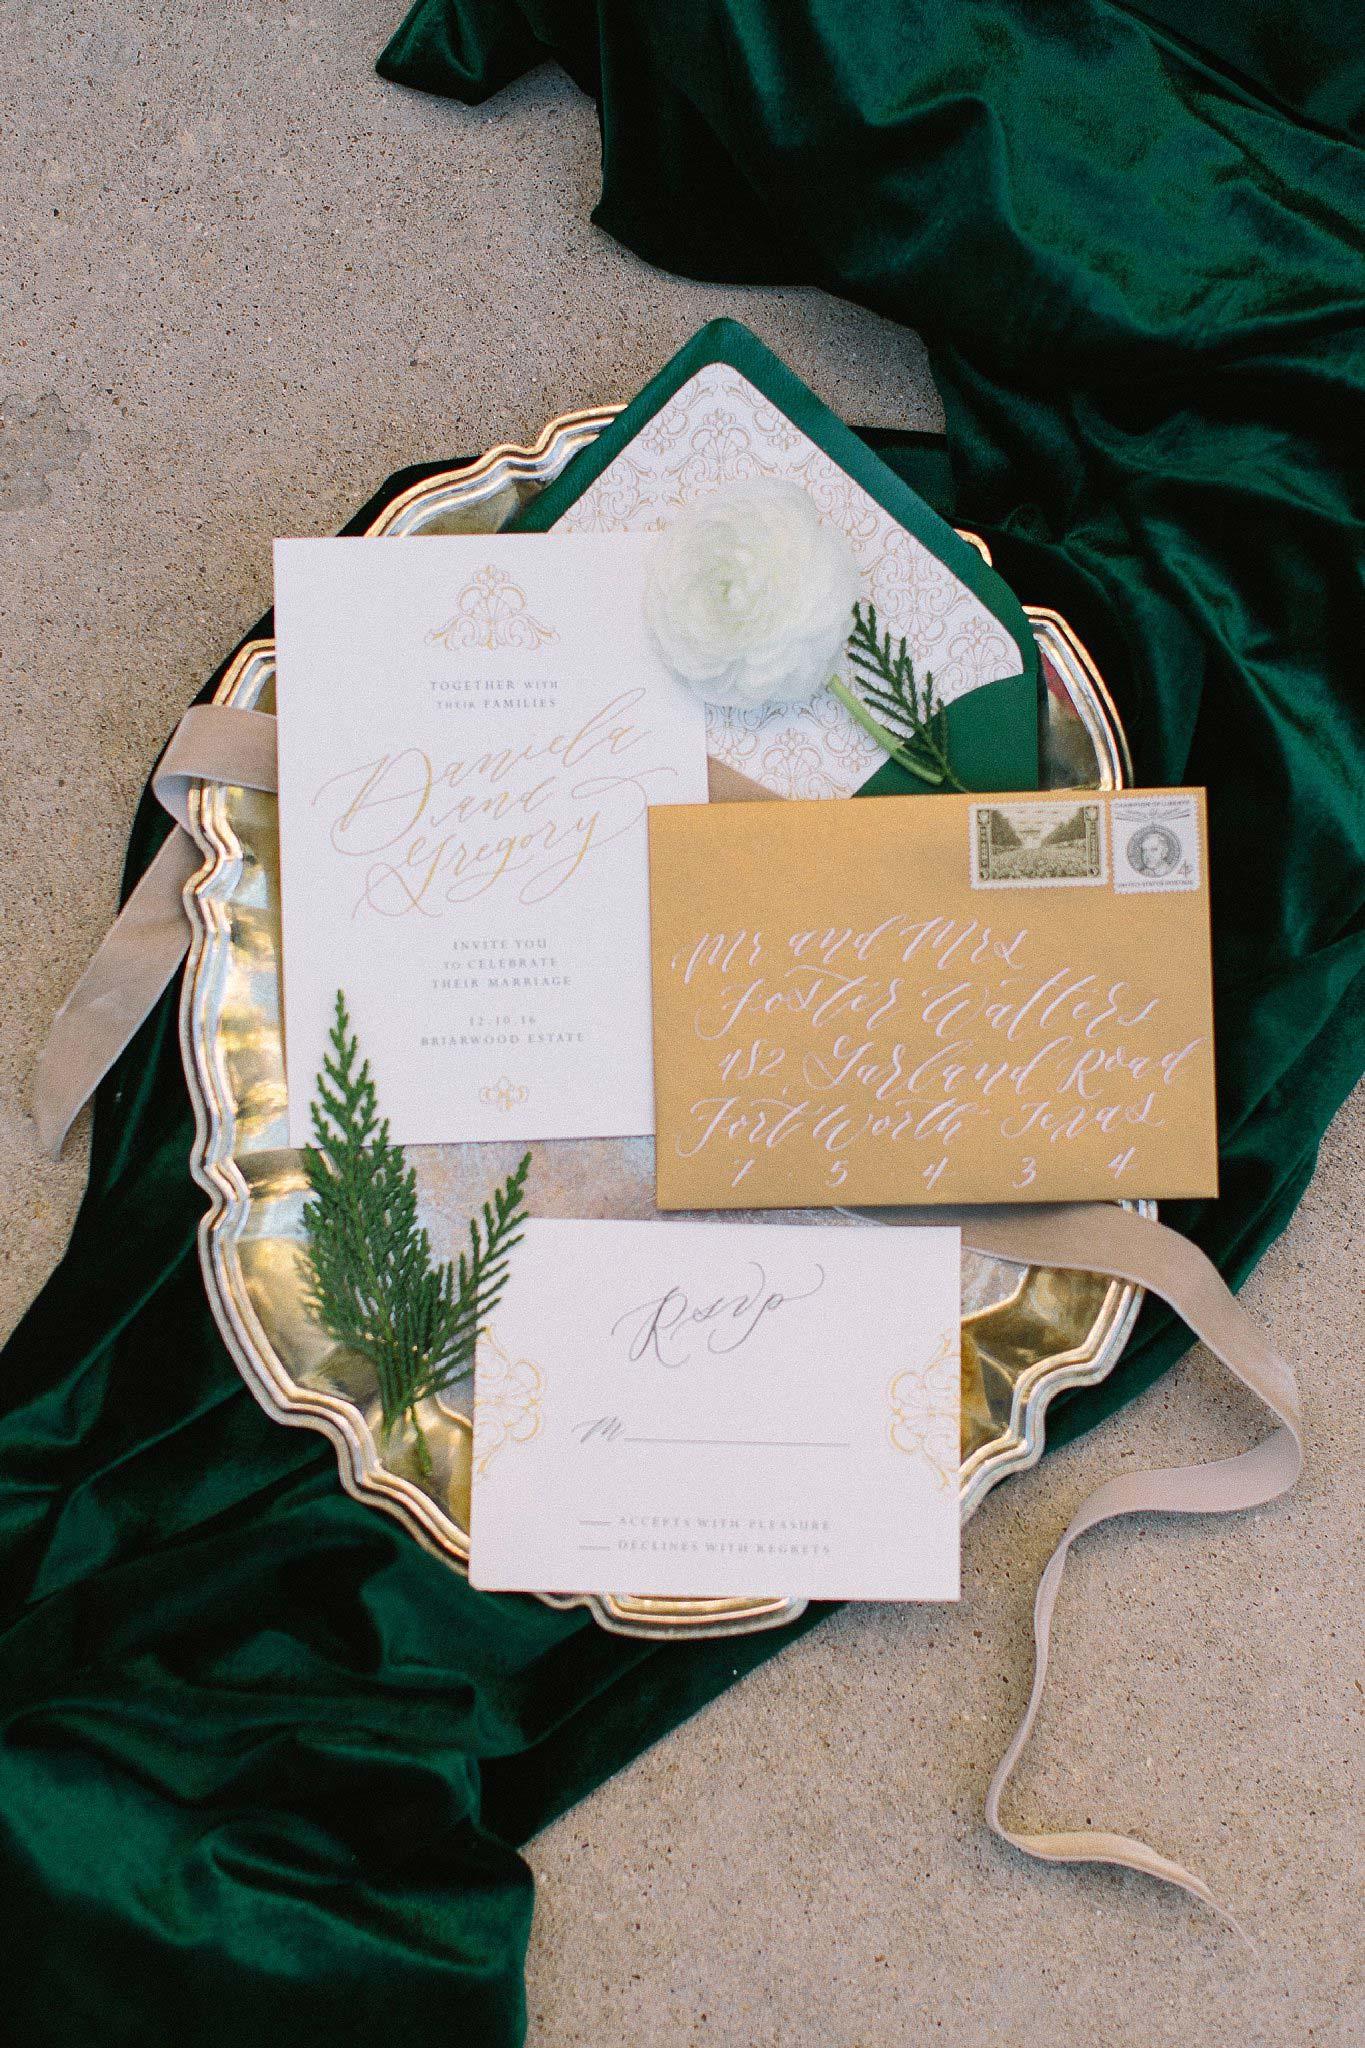 aristide mansfield wedding green and gold invitations on velvet green fabric